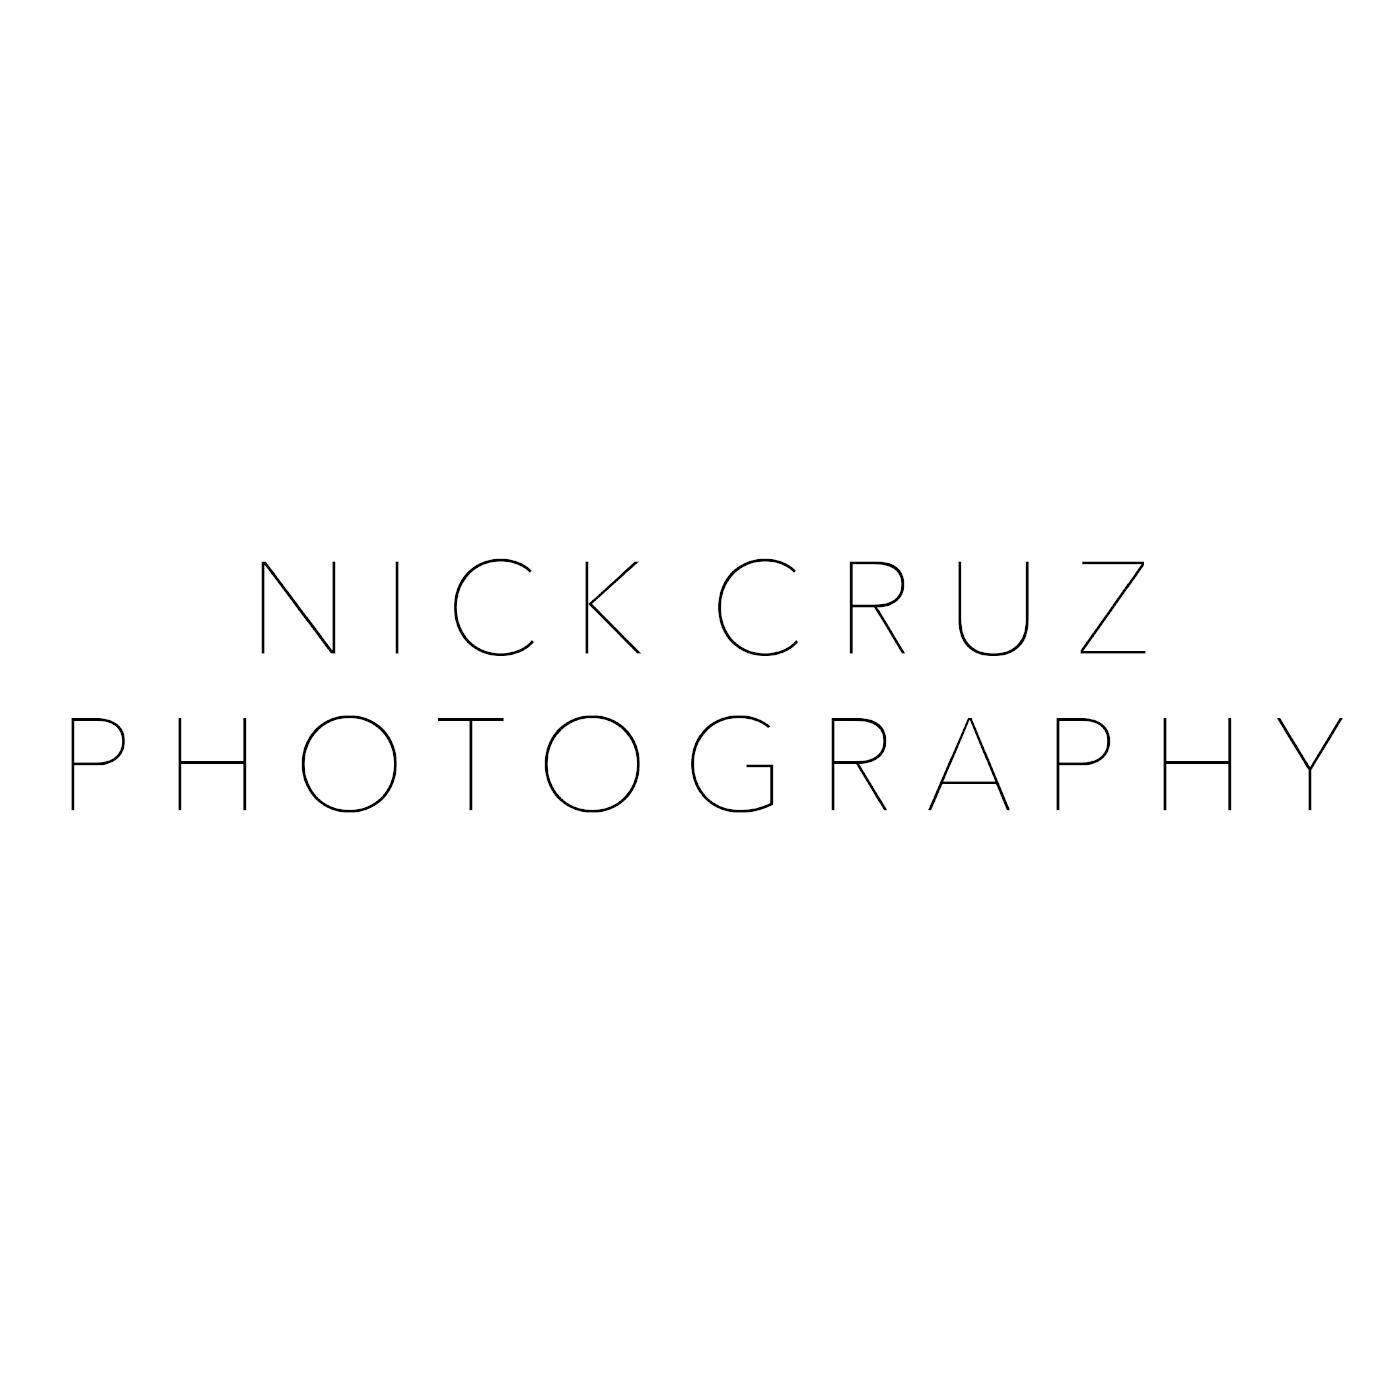 Nick Cruz Photography    Services:  - Branding + Strategy  - Logo  - PR